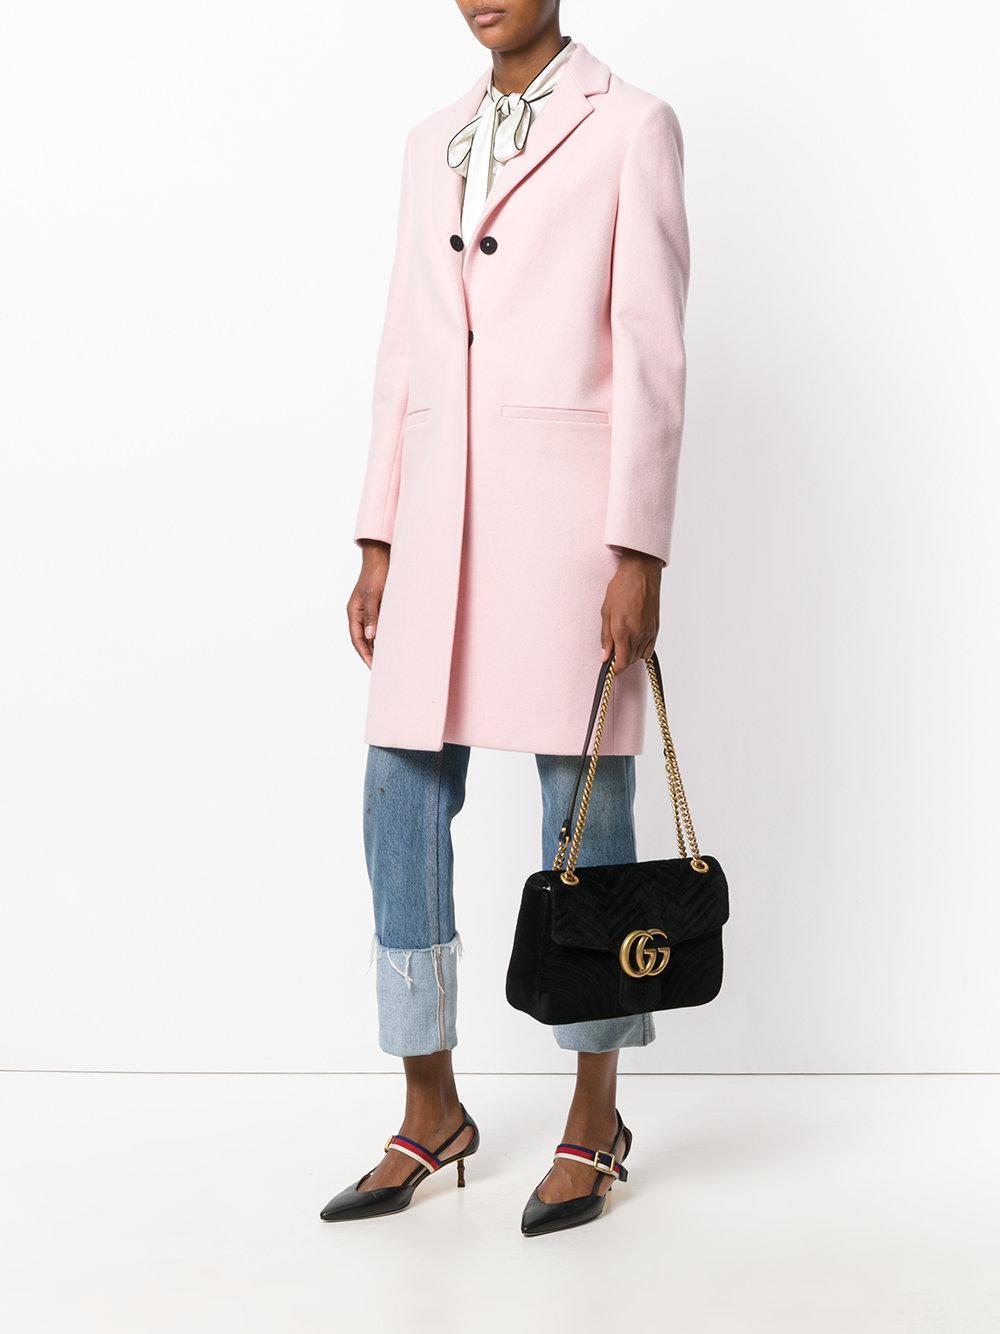 78f1b2405a Women's Black Marmont 2.0 Velvet Shoulder Bag